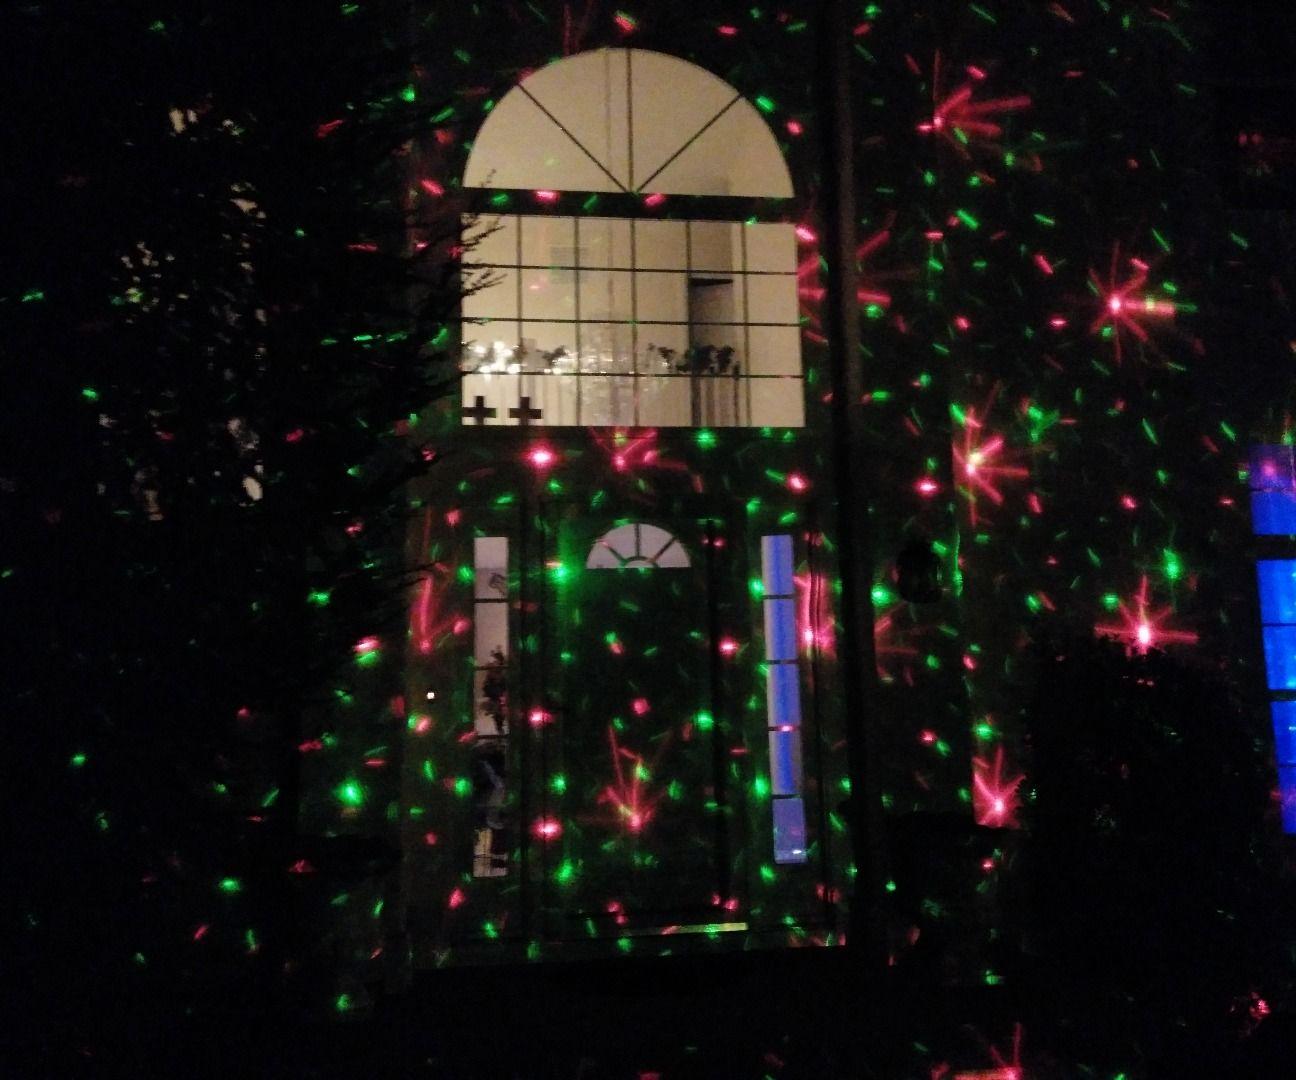 Cheap DIY Christmas Laser Light Show ~$16